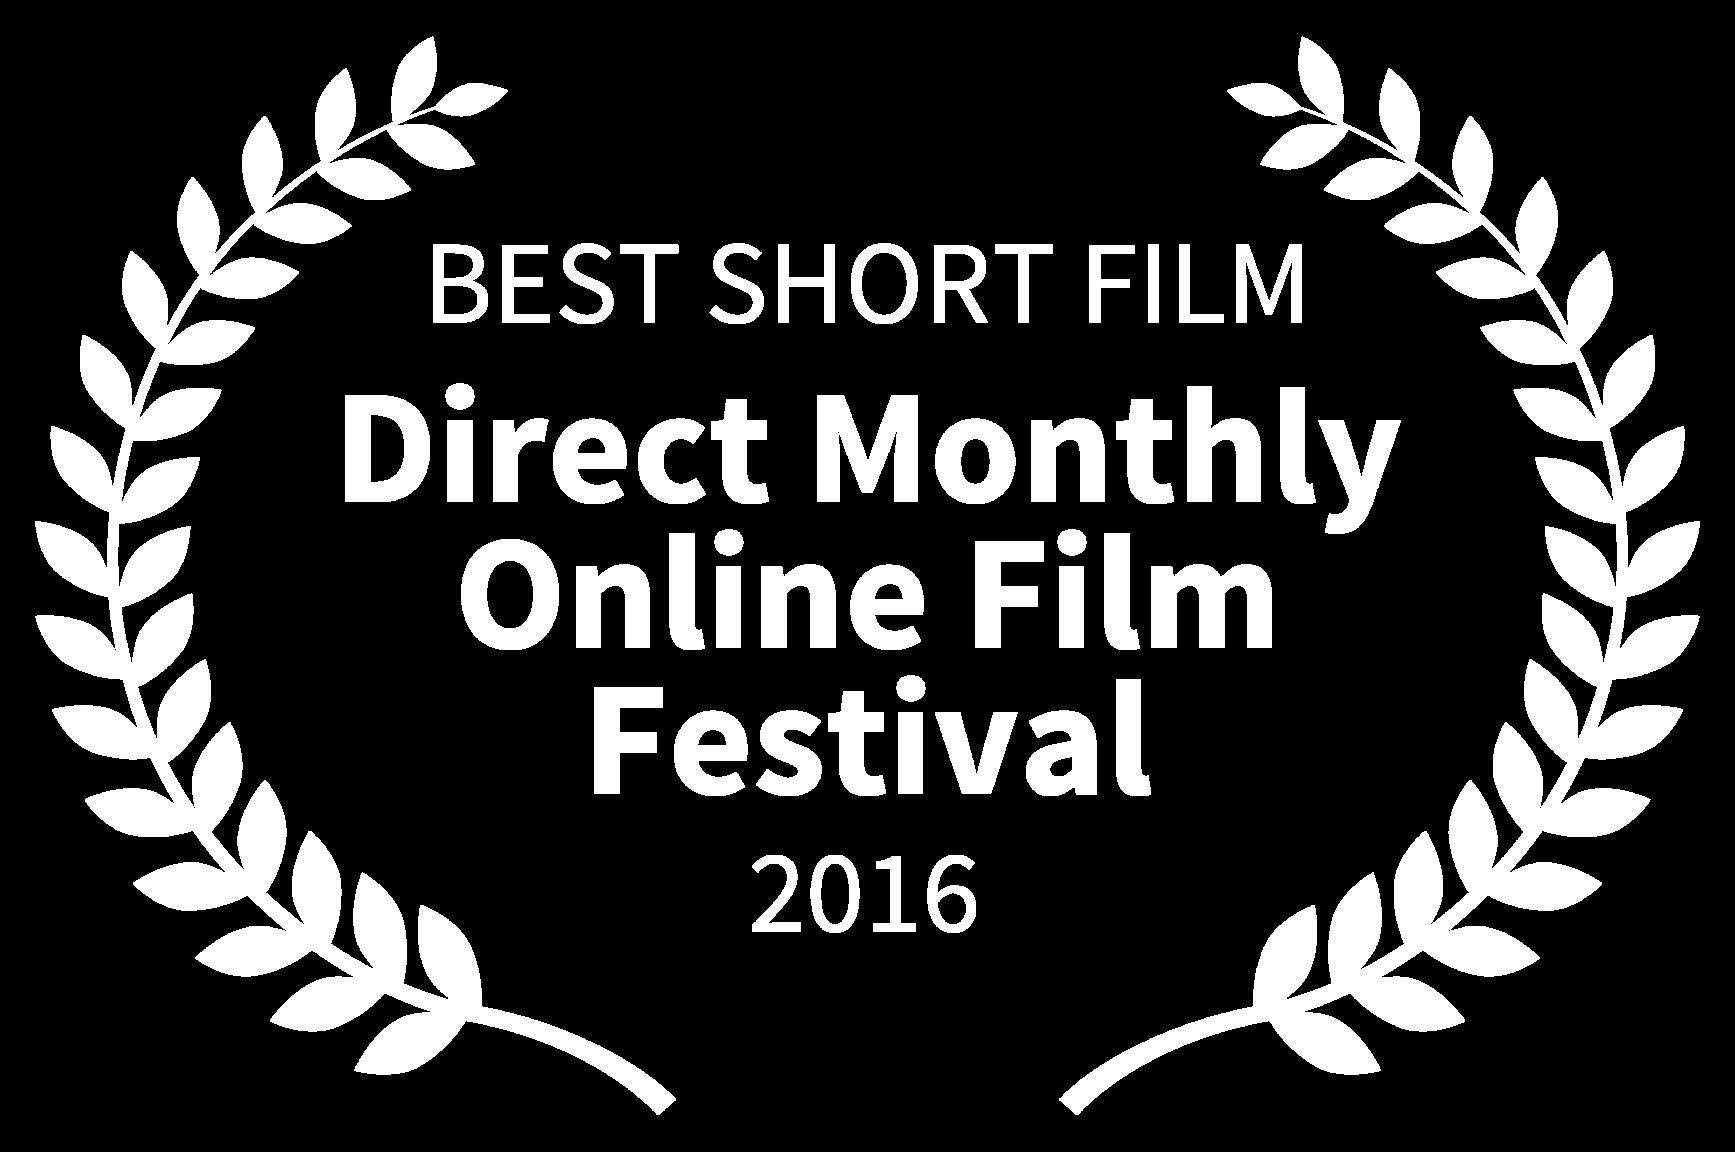 BEST SHORT FILM - Direct Monthly Online Film Festival - 2016